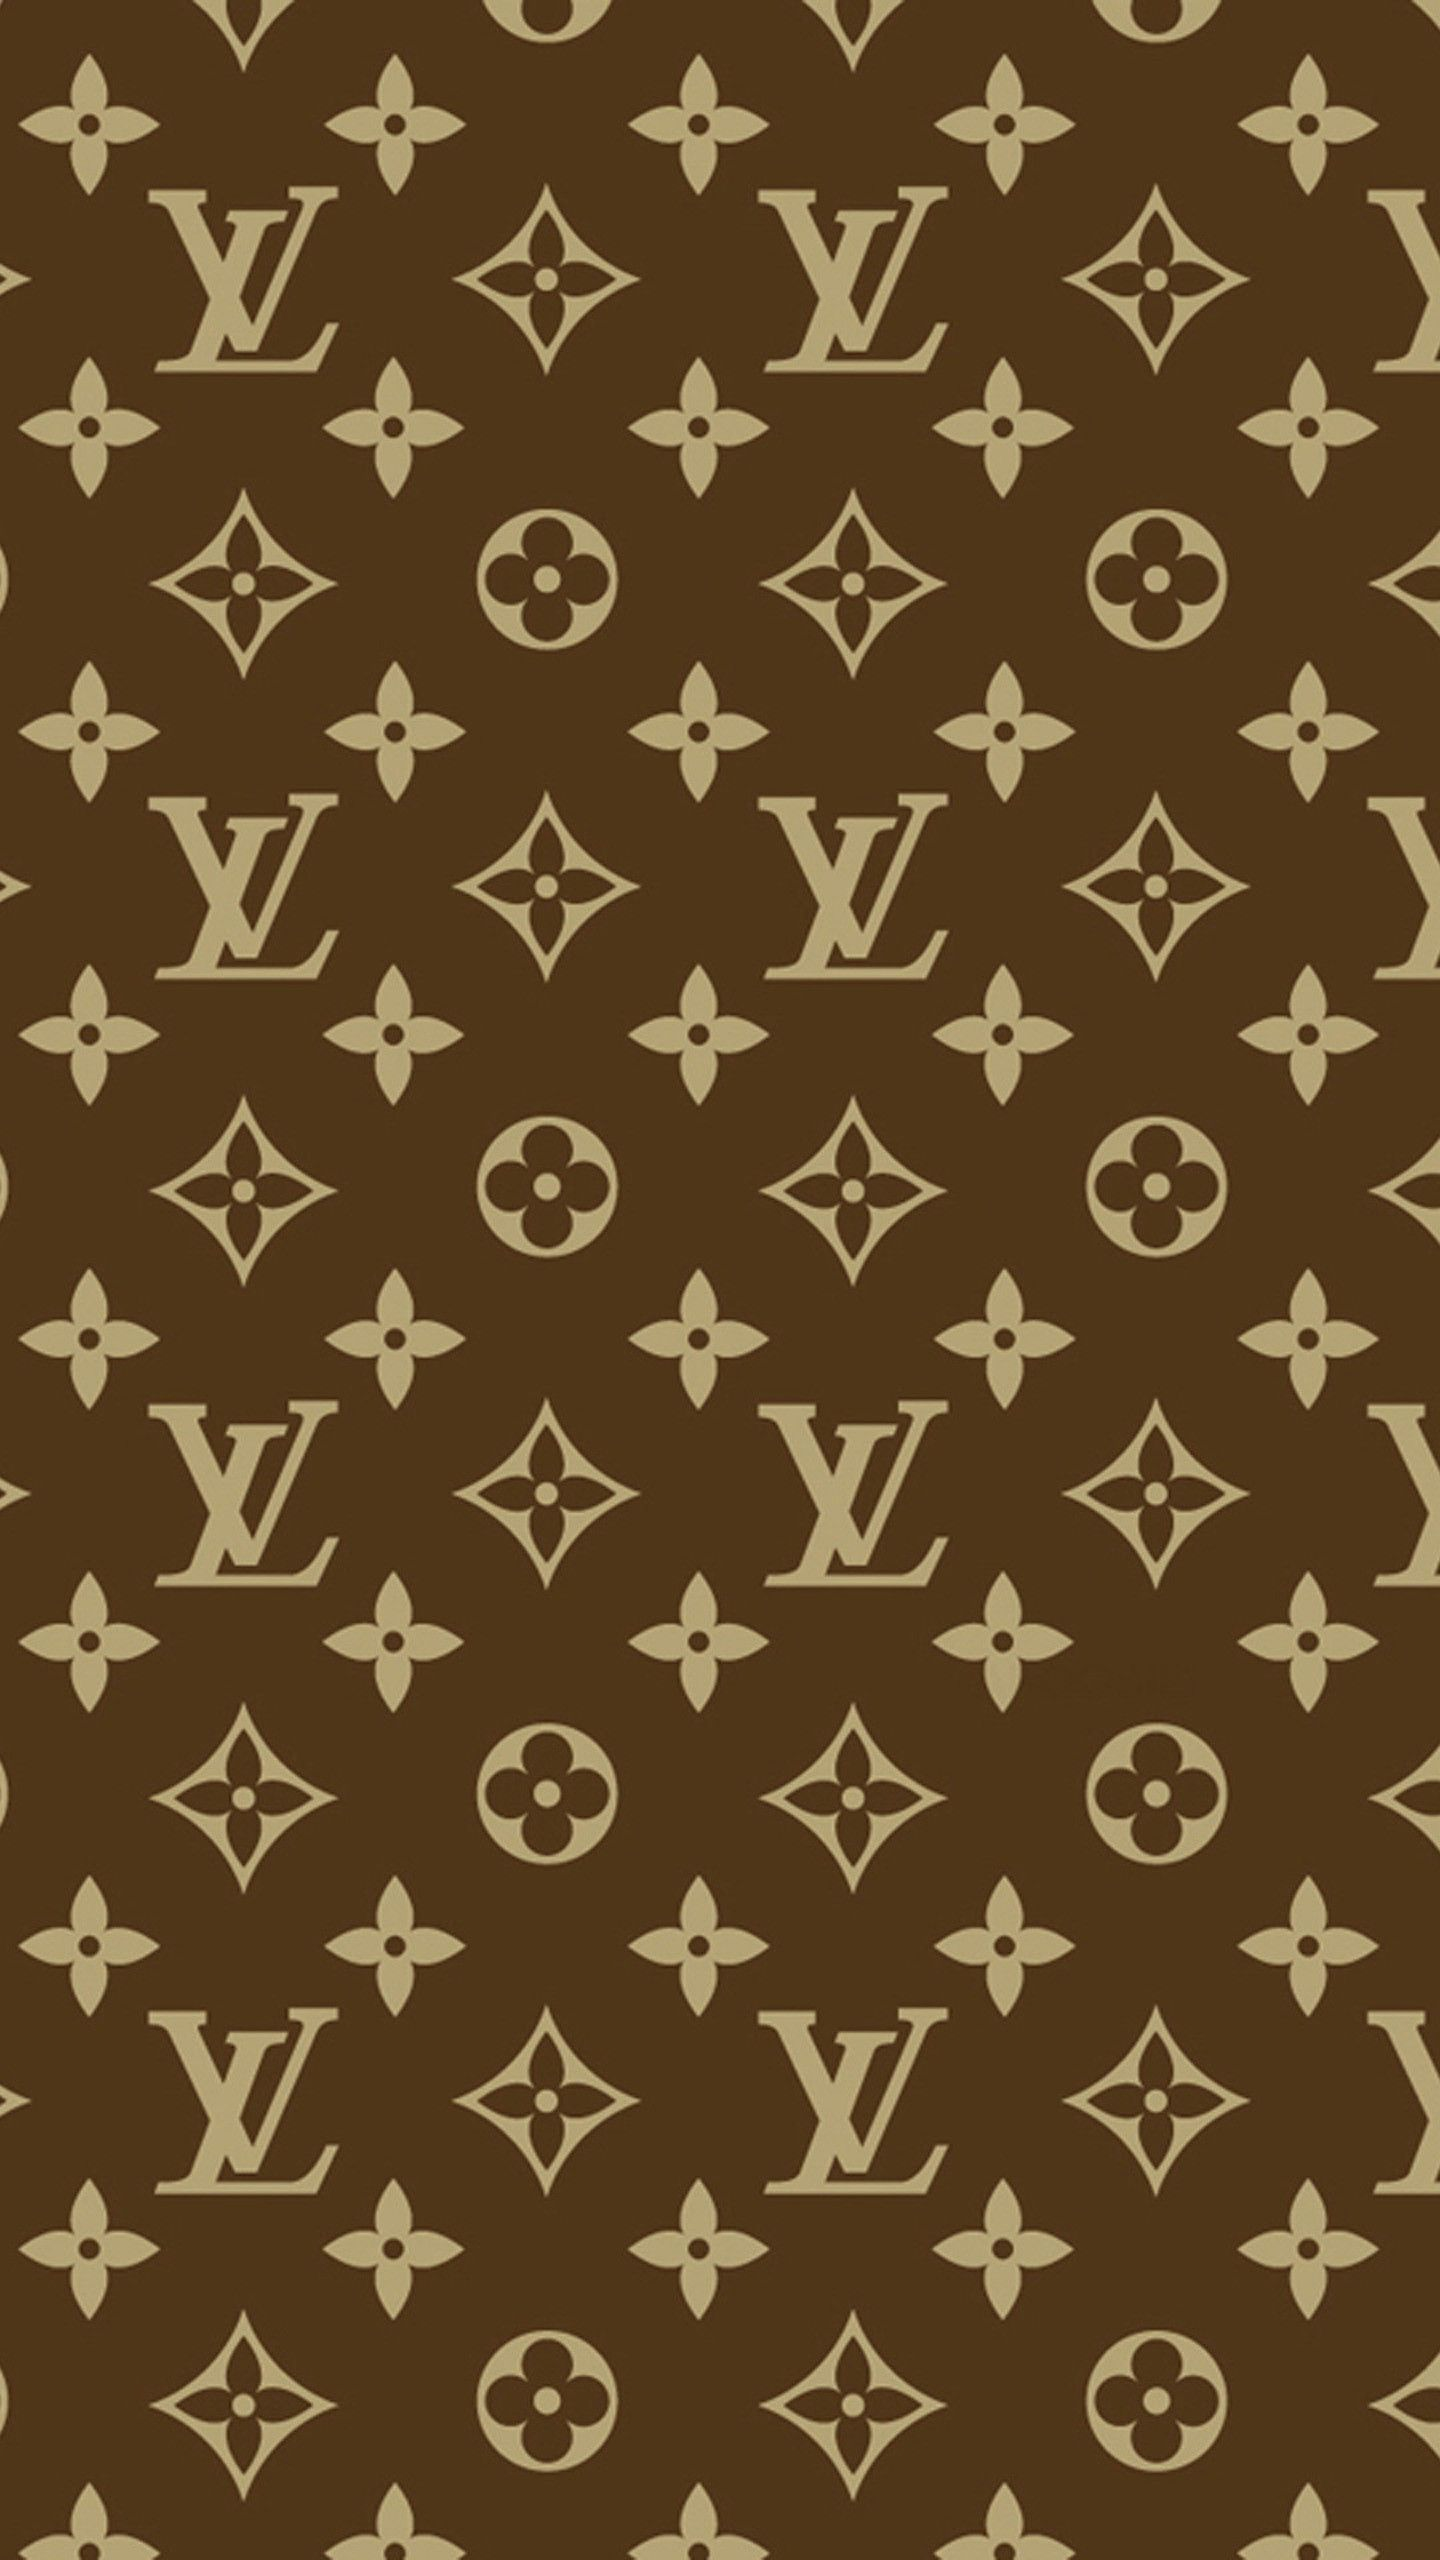 Louis vuitton galaxy wallpaper